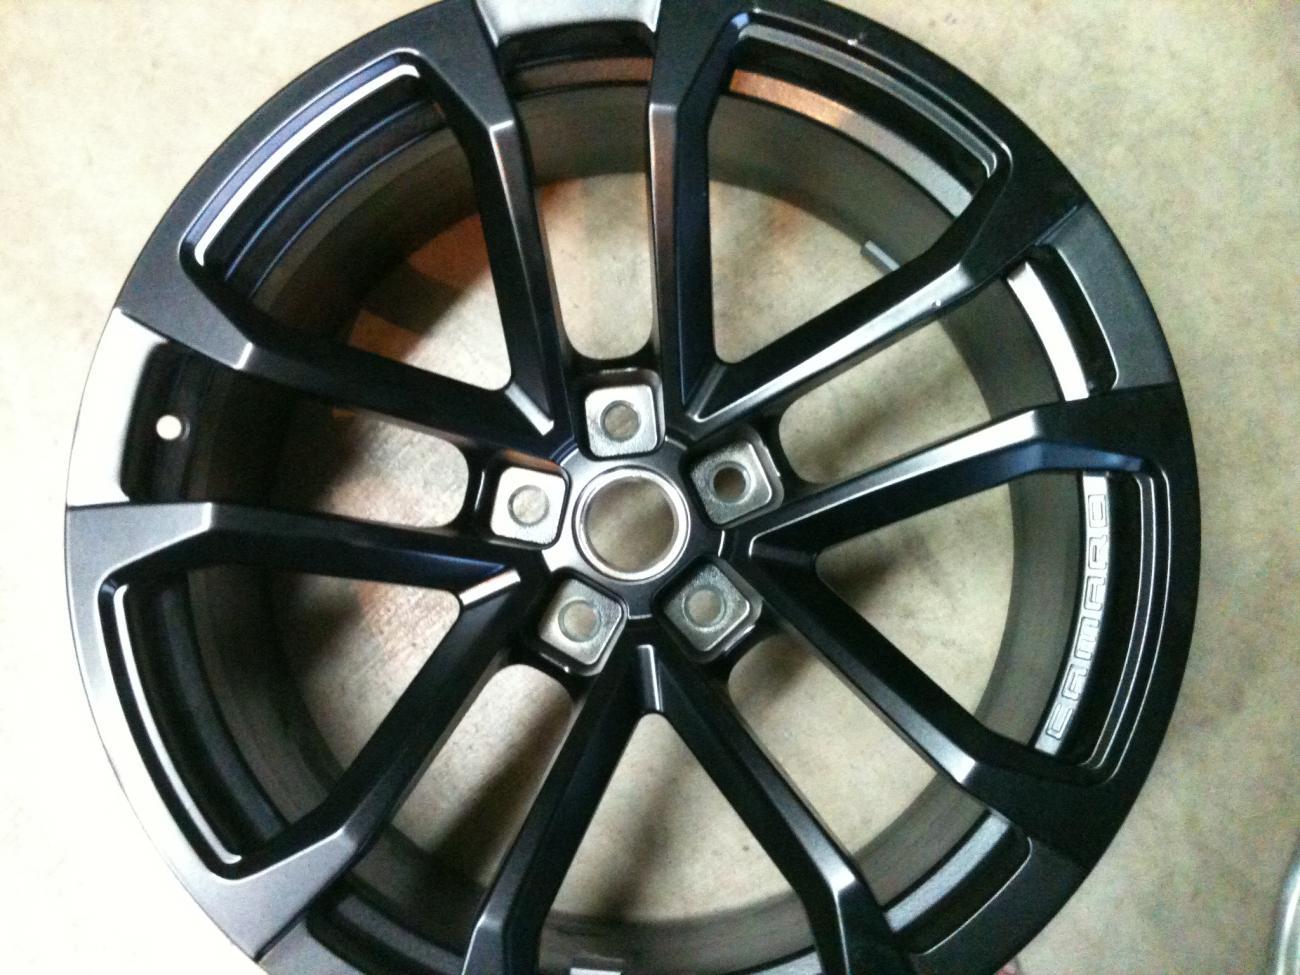 Zl1 Wheels For Sale On Ebay Camaro5 Chevy Camaro Forum